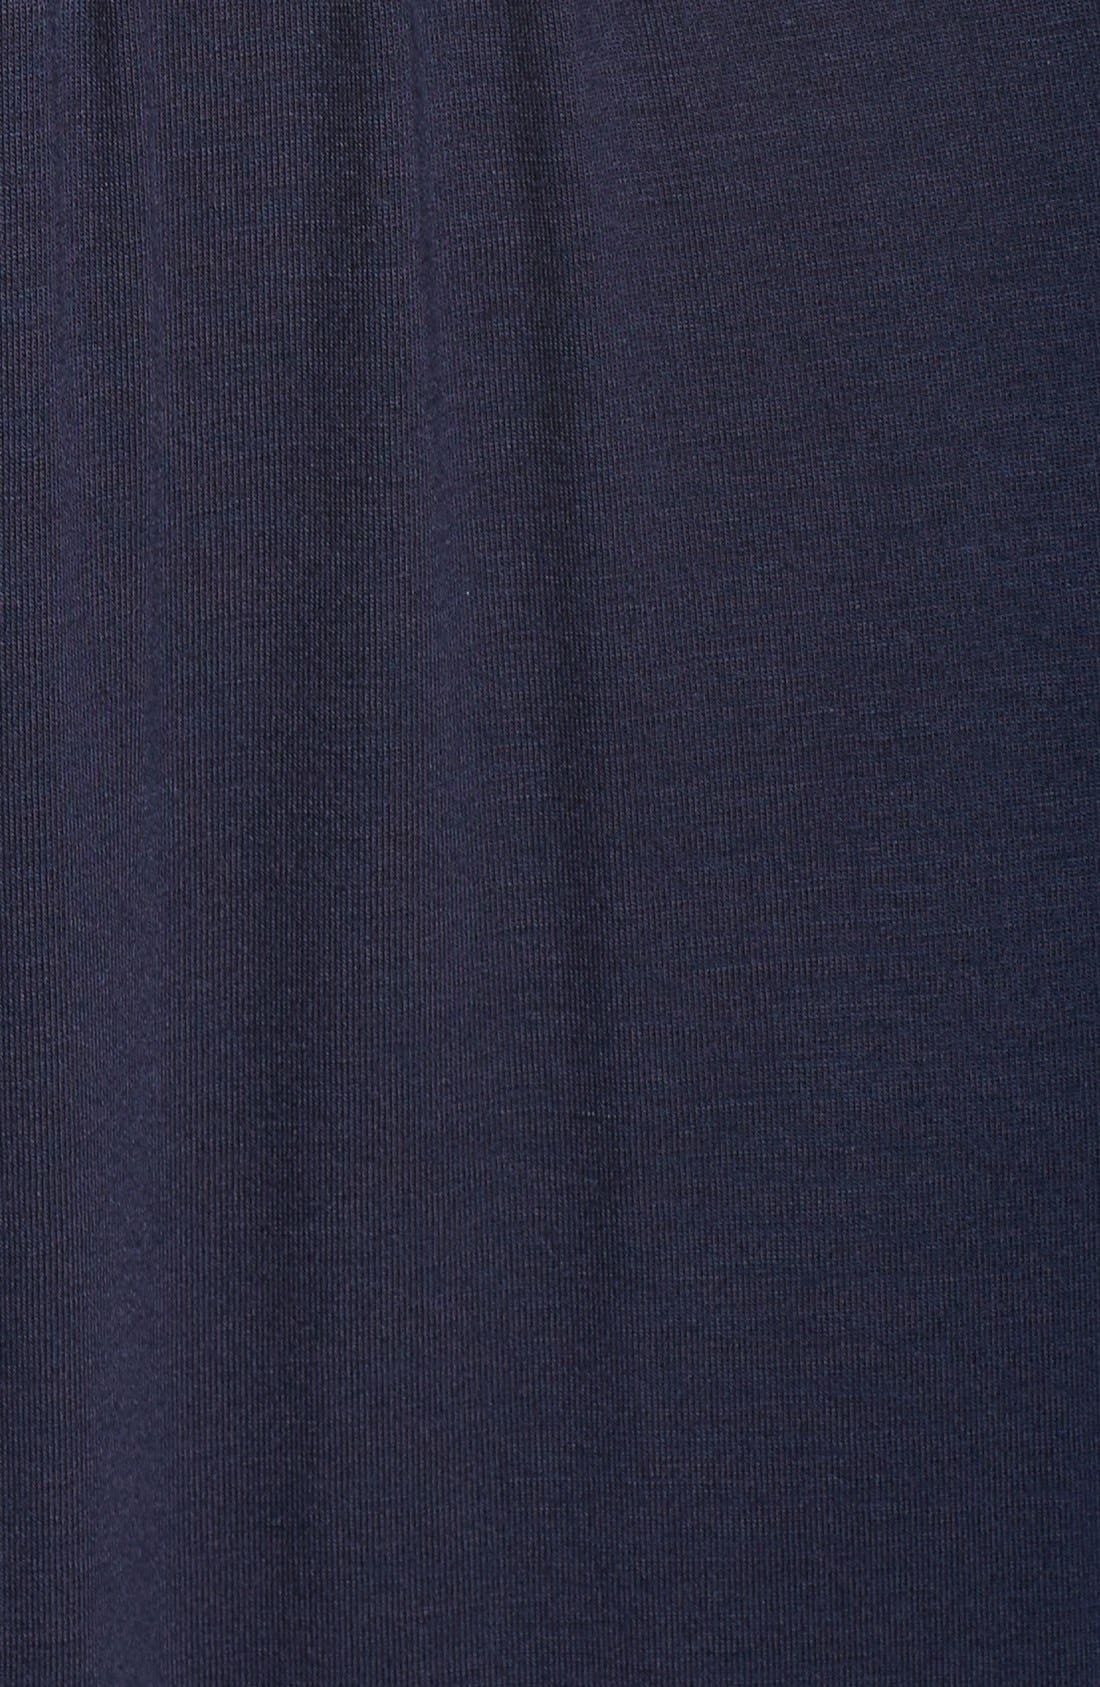 V-Neck Jersey Dress,                             Alternate thumbnail 5, color,                             Indigo